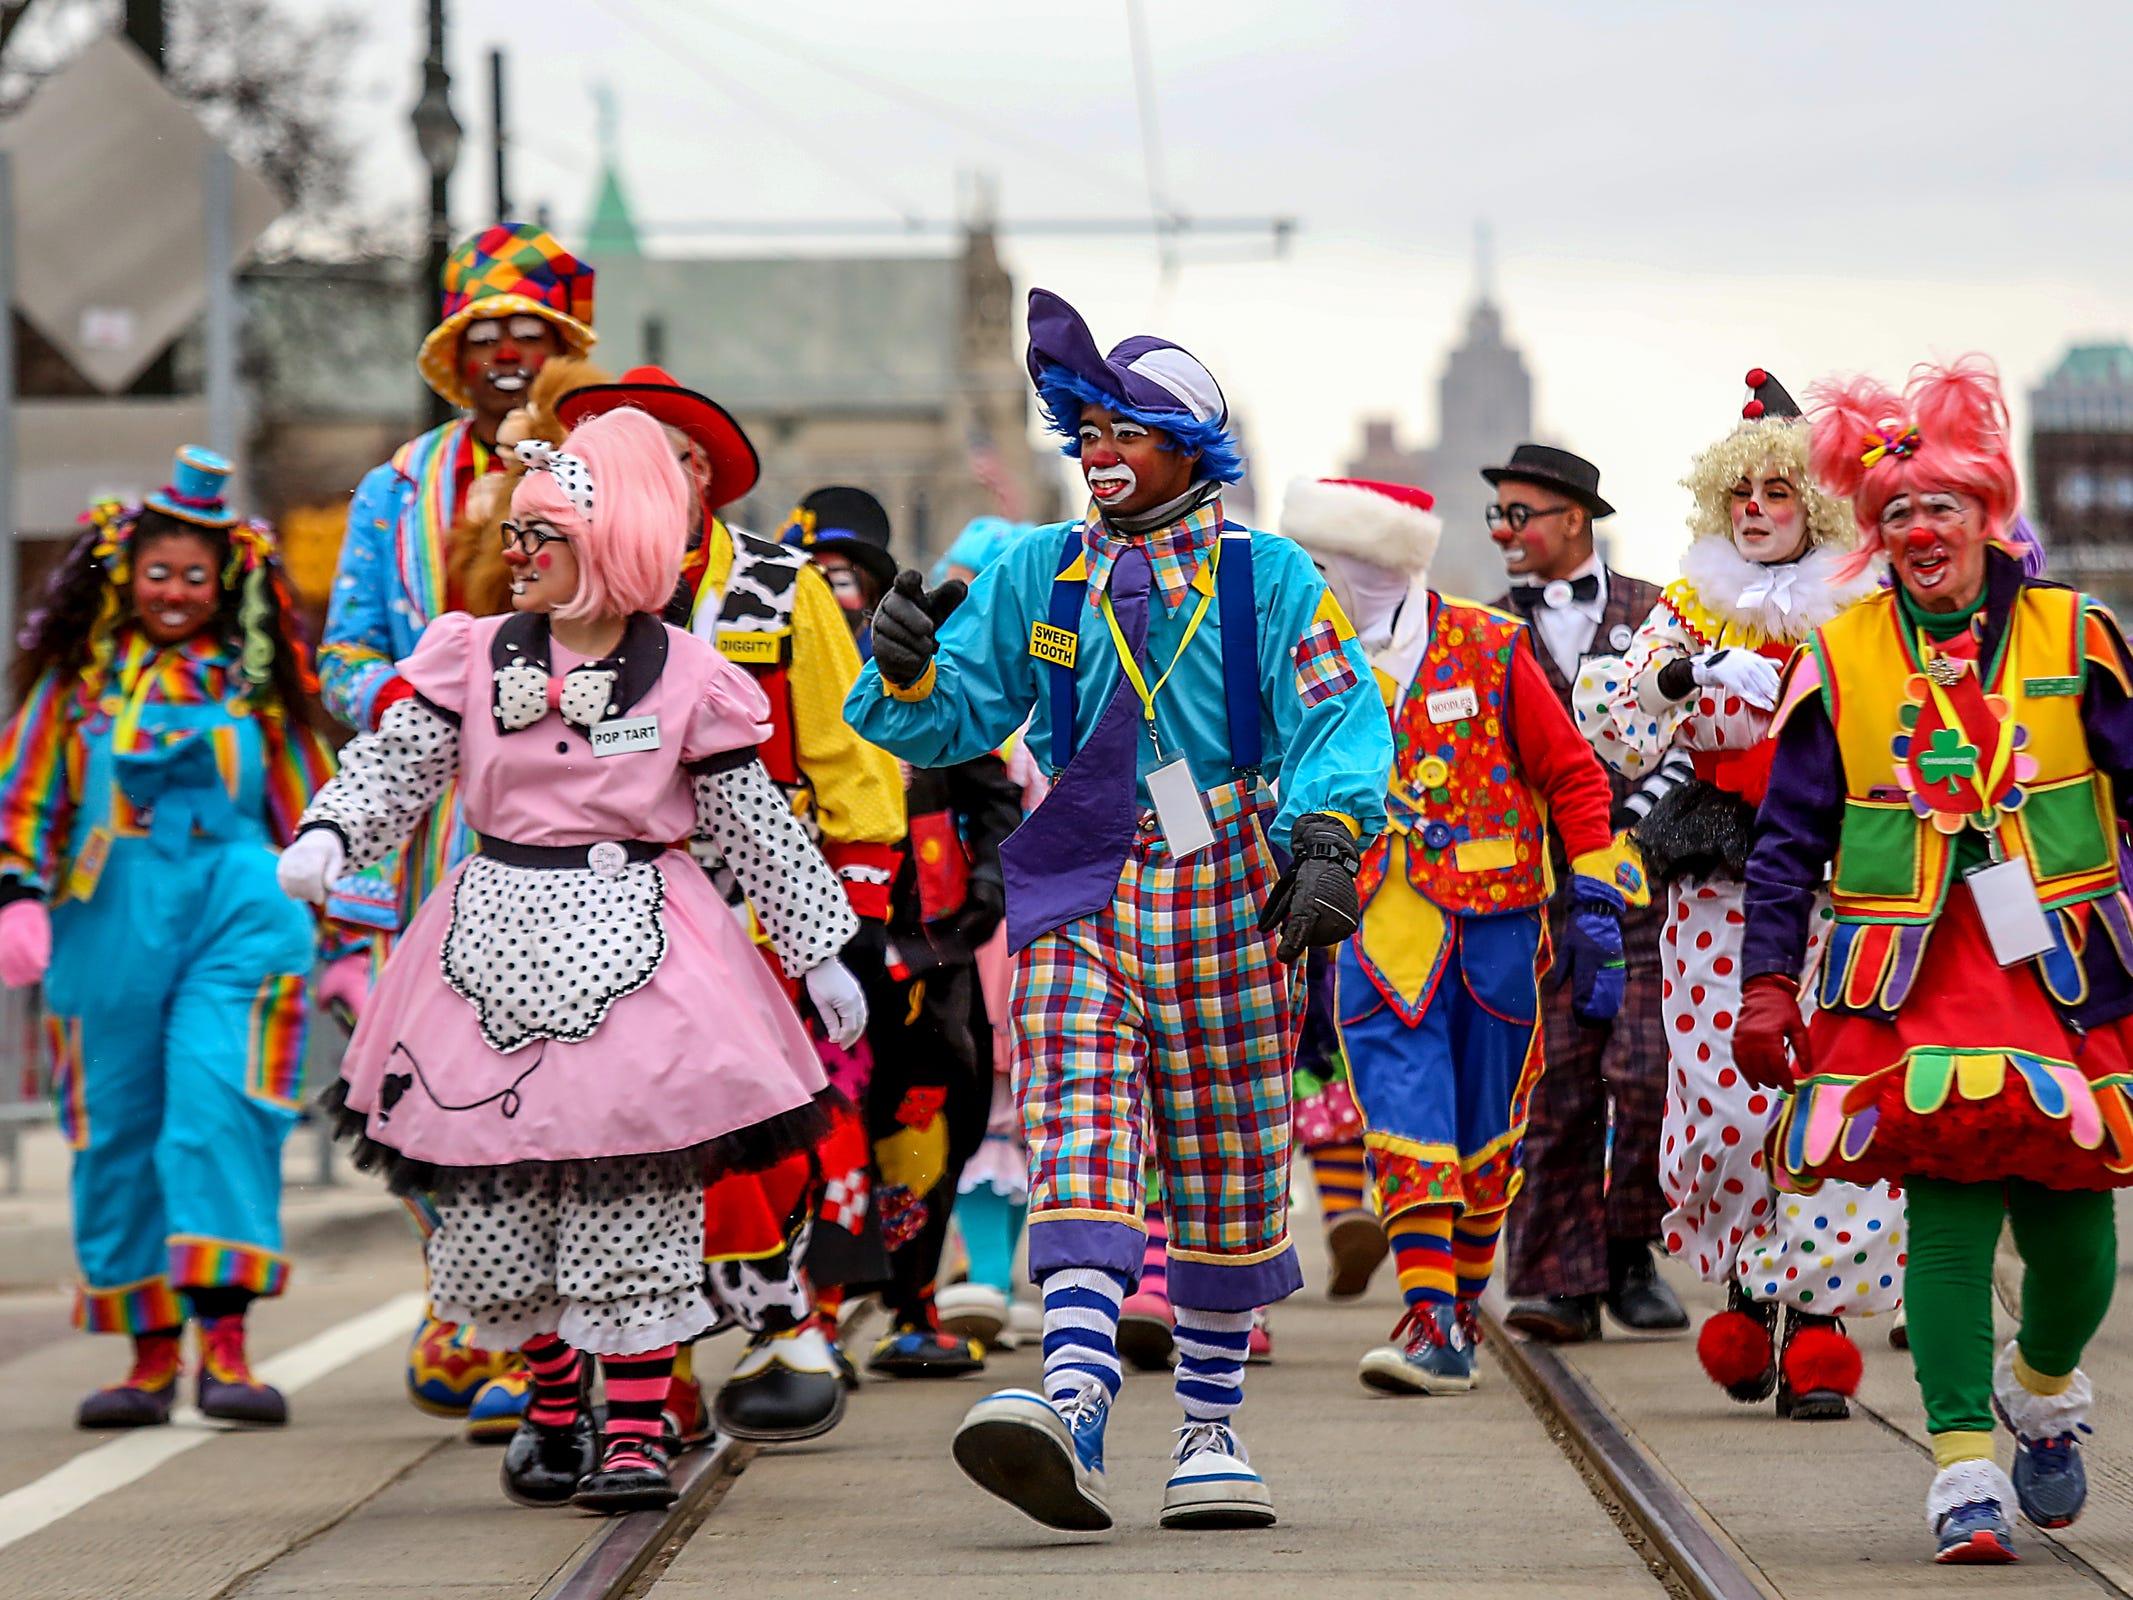 Mott Campus Clowns, of Mott Community College participate in America's Thanksgiving Parade in Detroit on Thursday, Nov. 22, 2018.